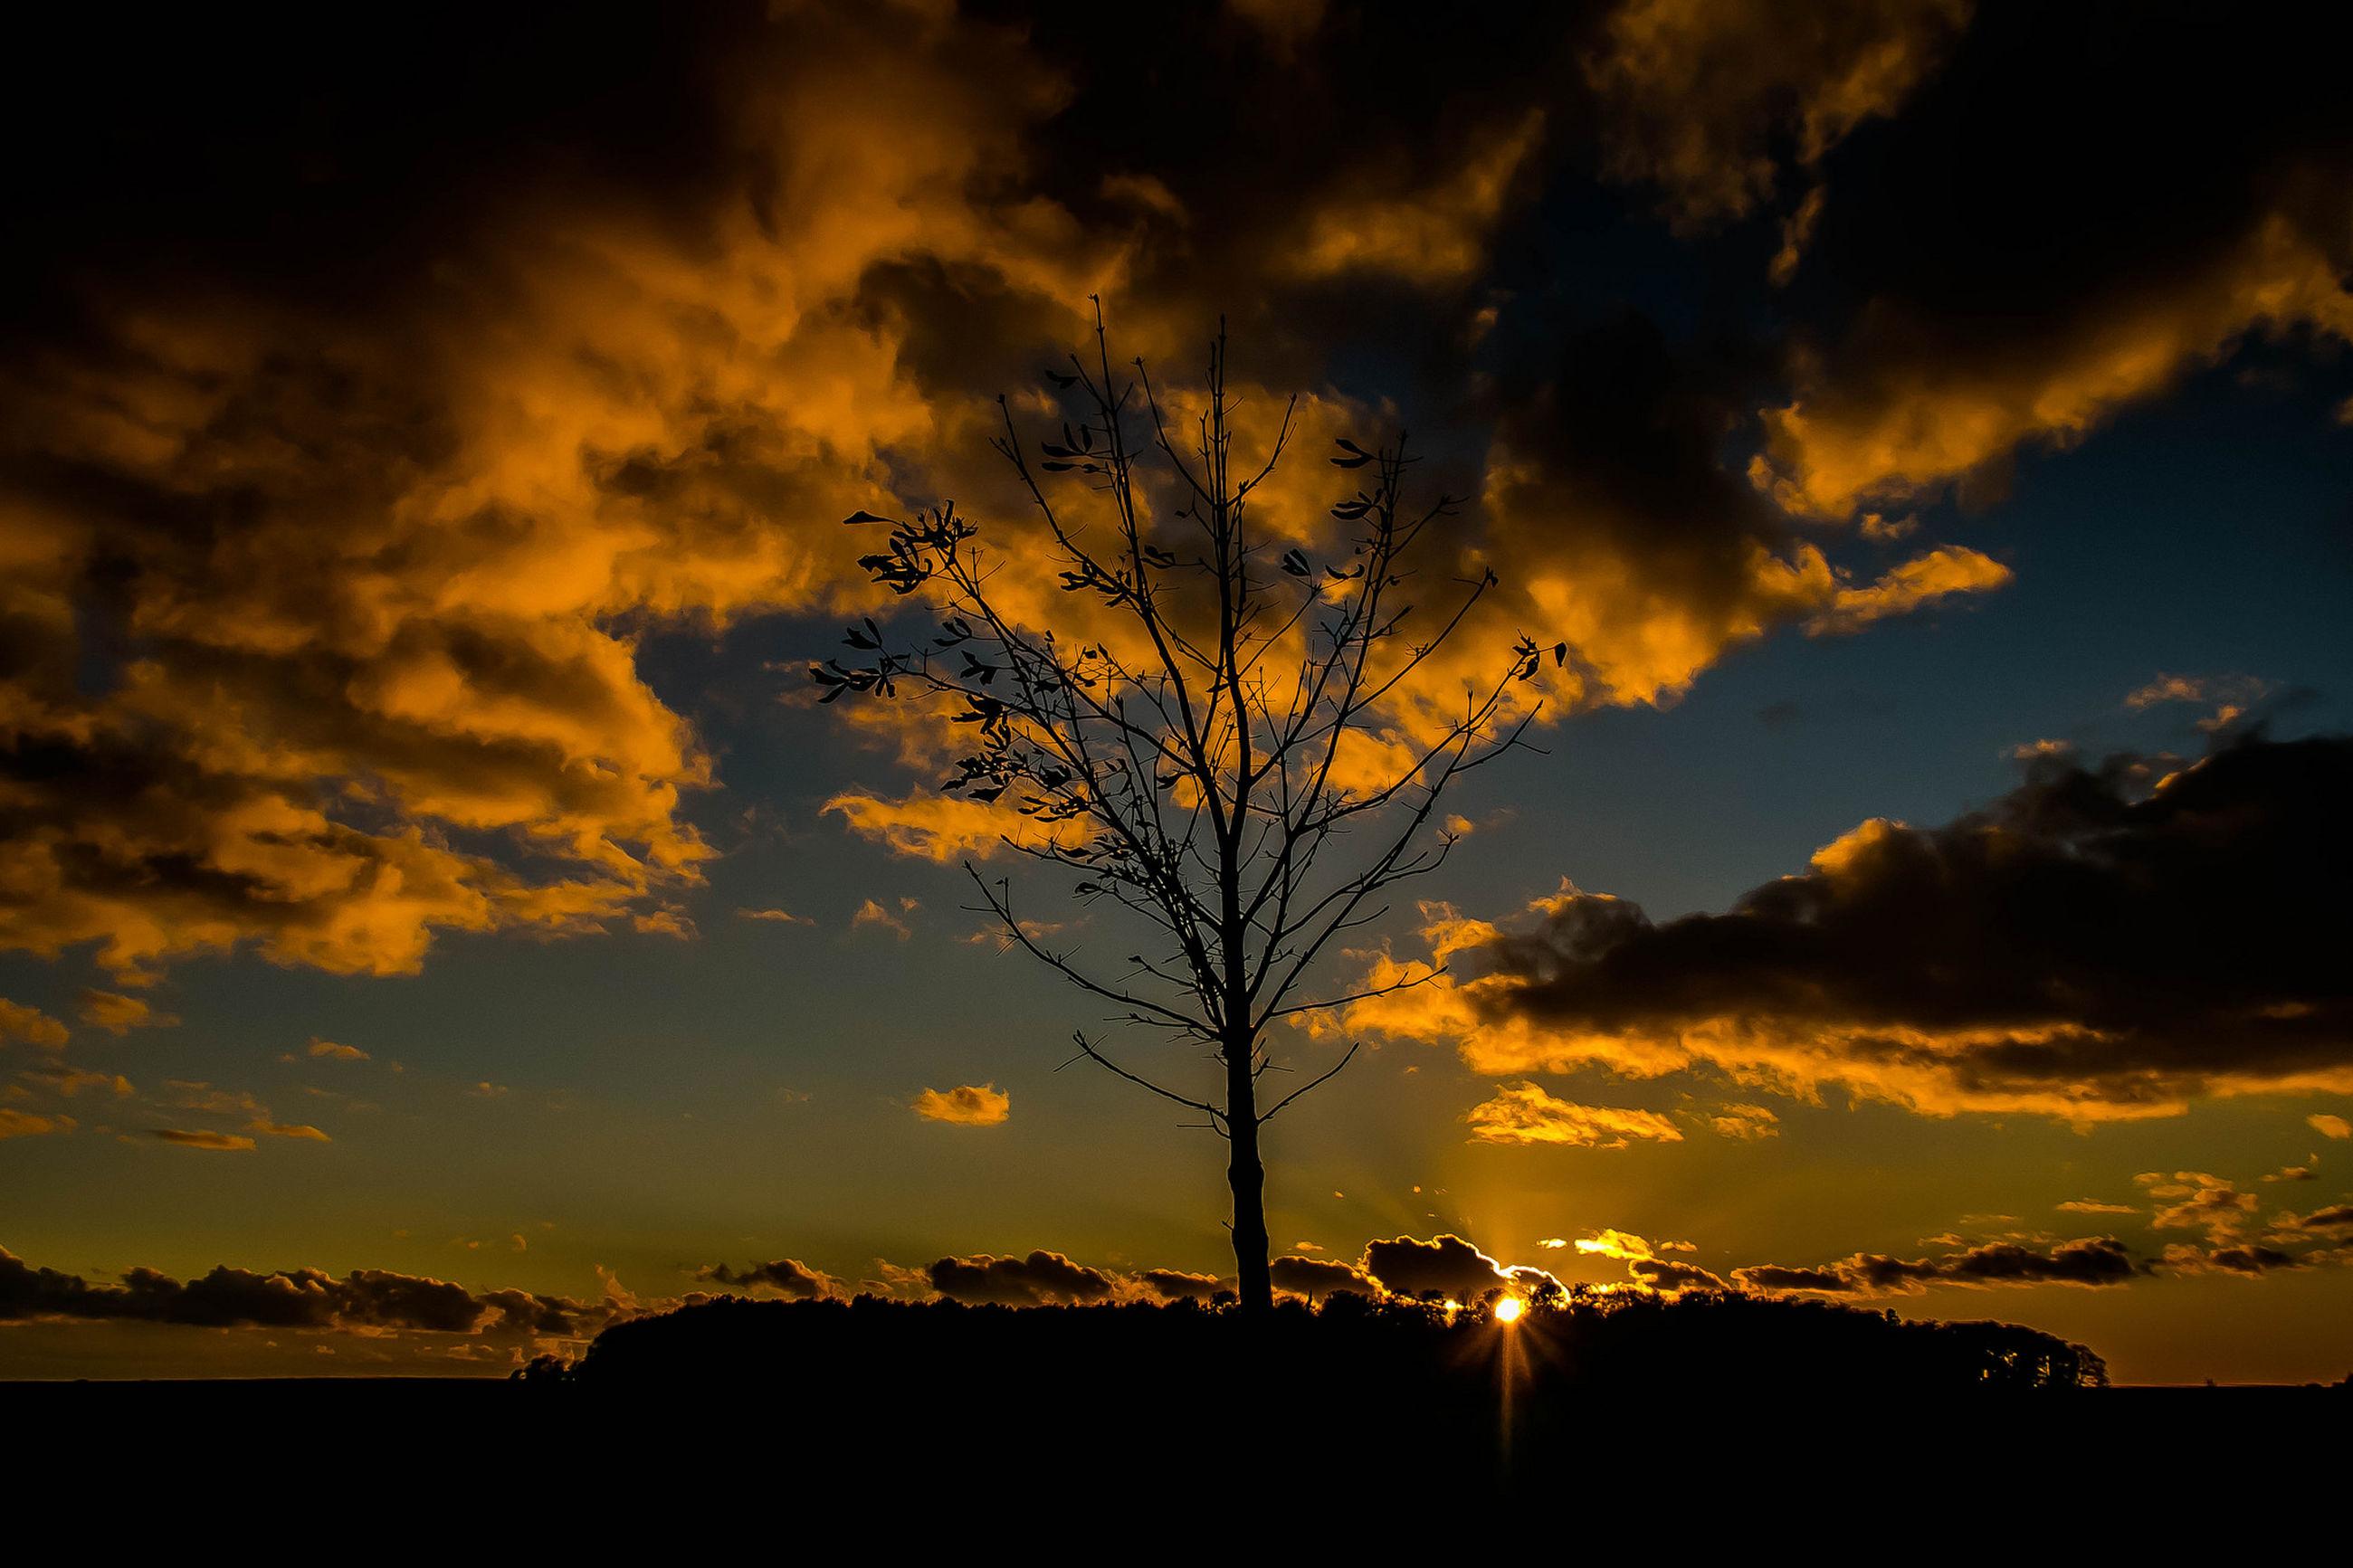 sunset, orange color, silhouette, cloud - sky, dramatic sky, cloudscape, beauty in nature, nature, tree, scenics, sky, no people, outdoors